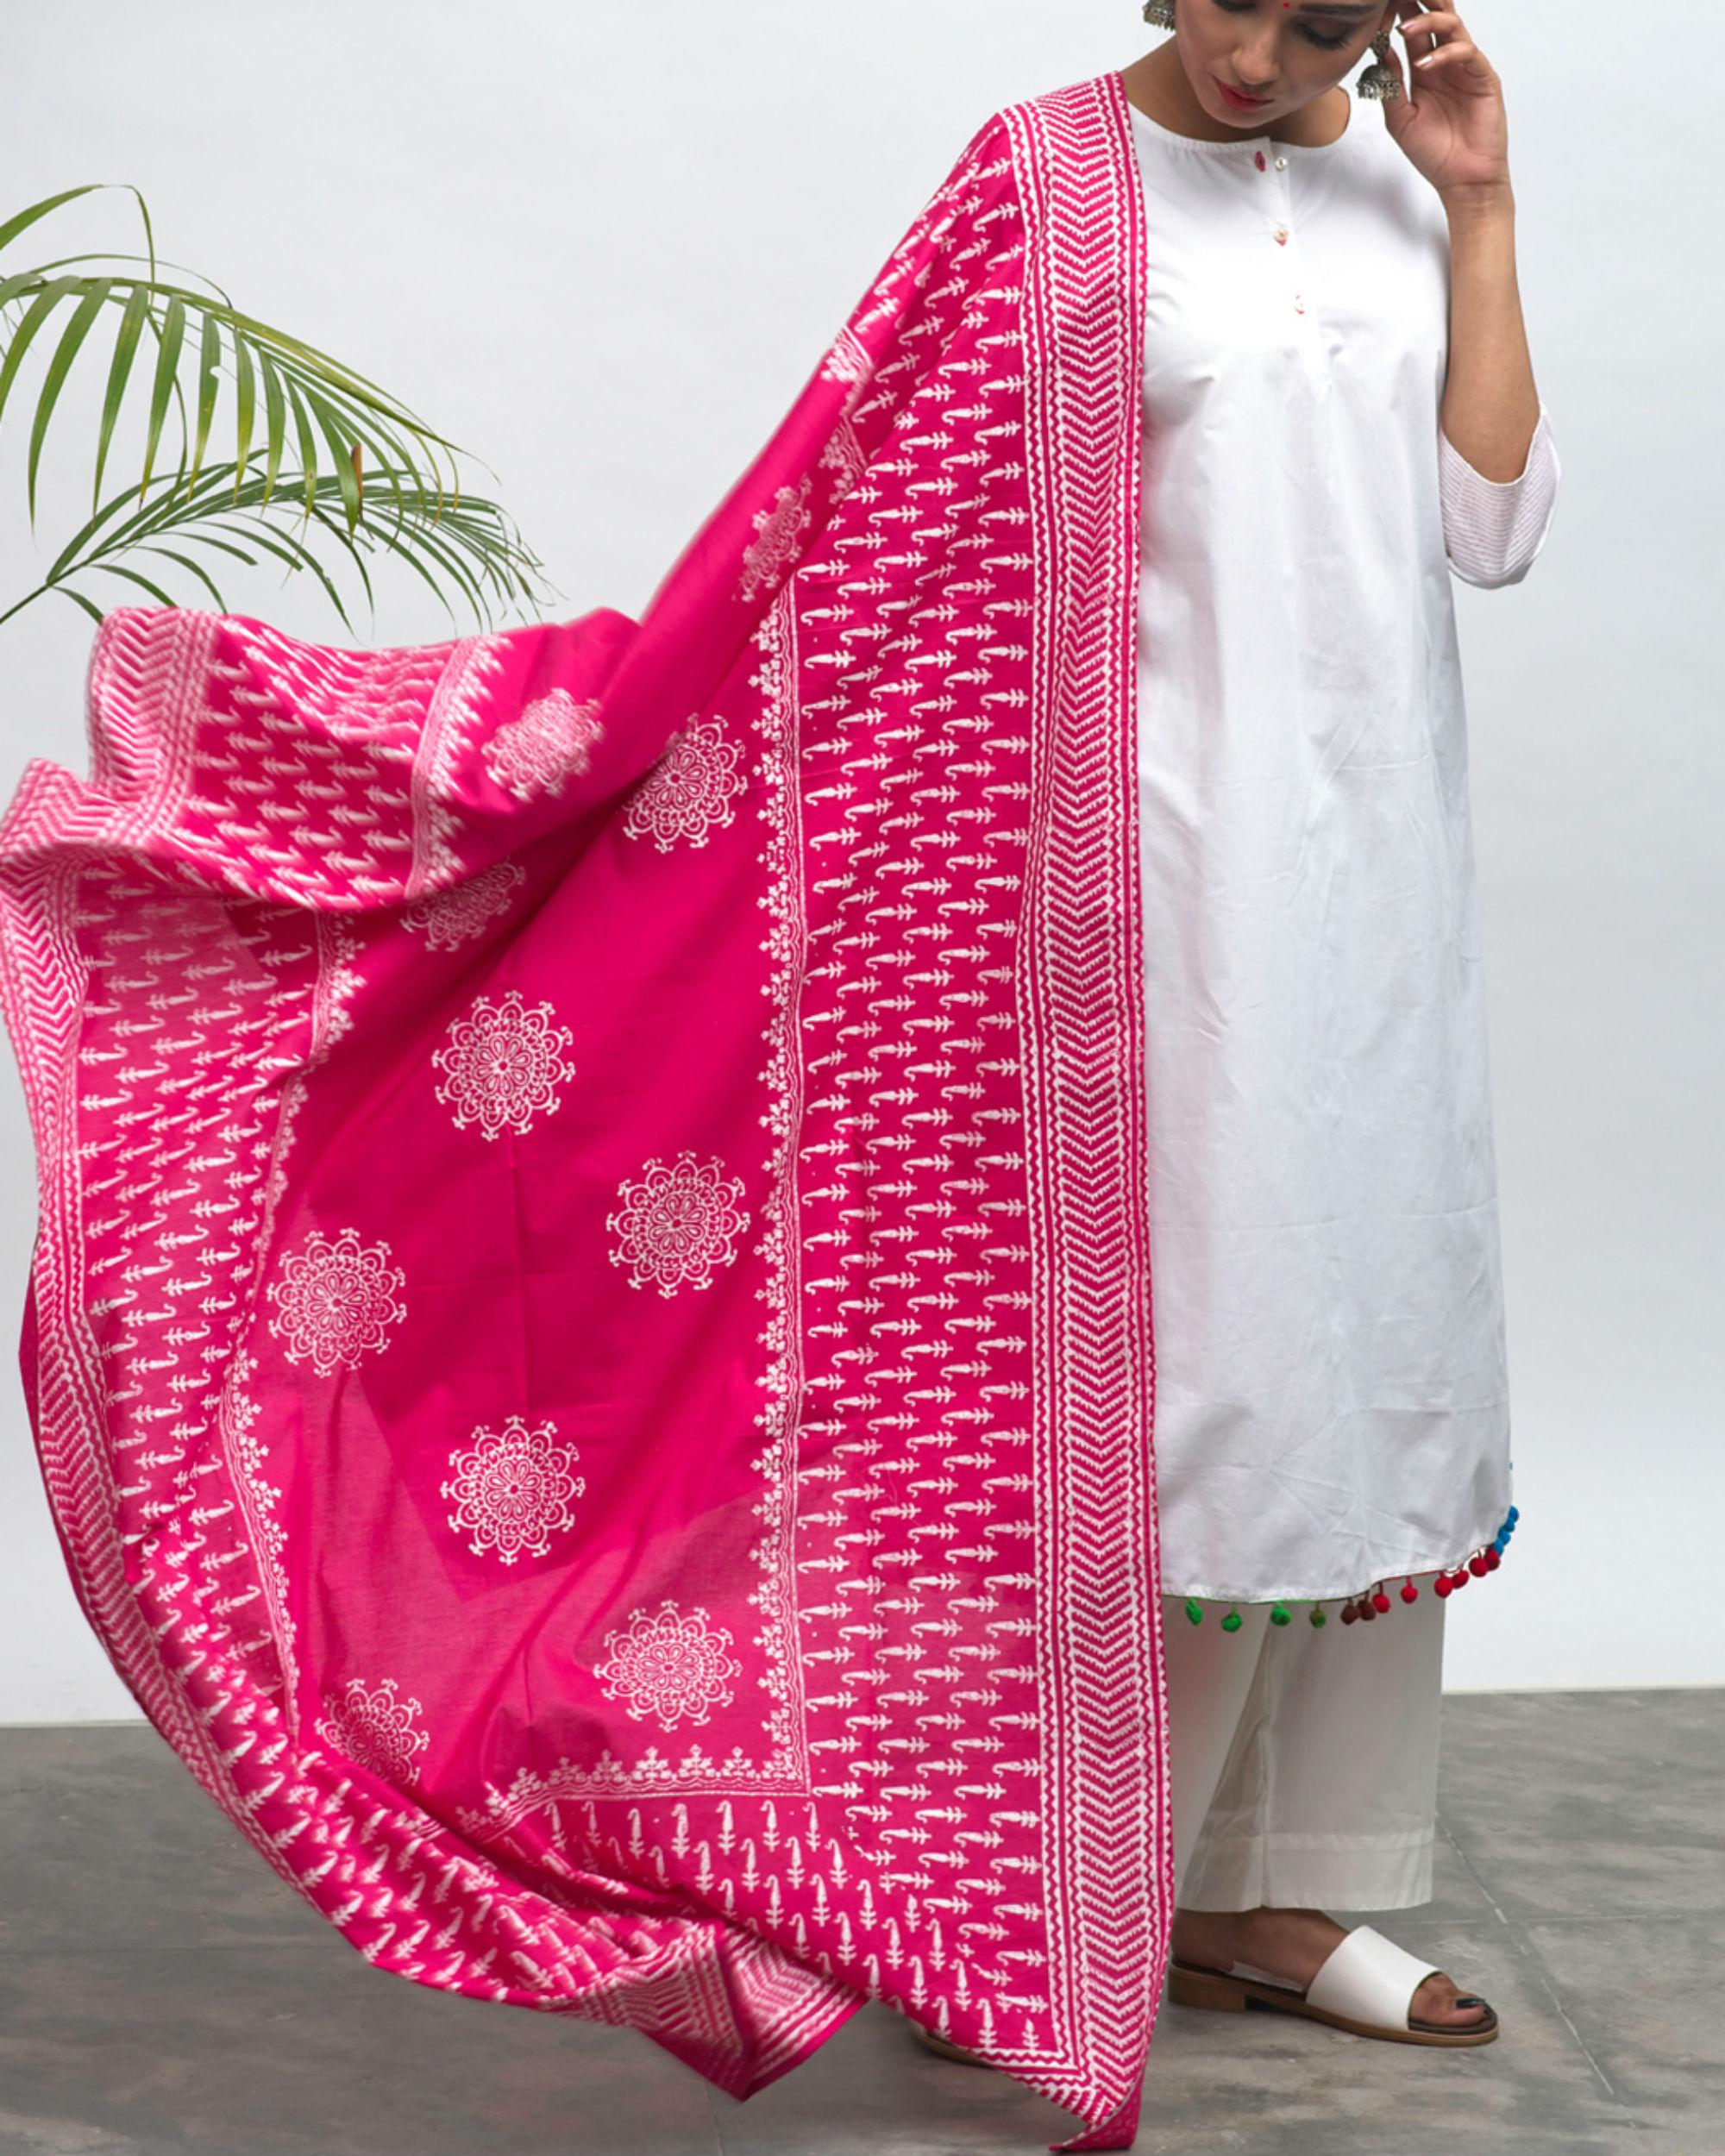 Maharani kurta pants and dupatta set